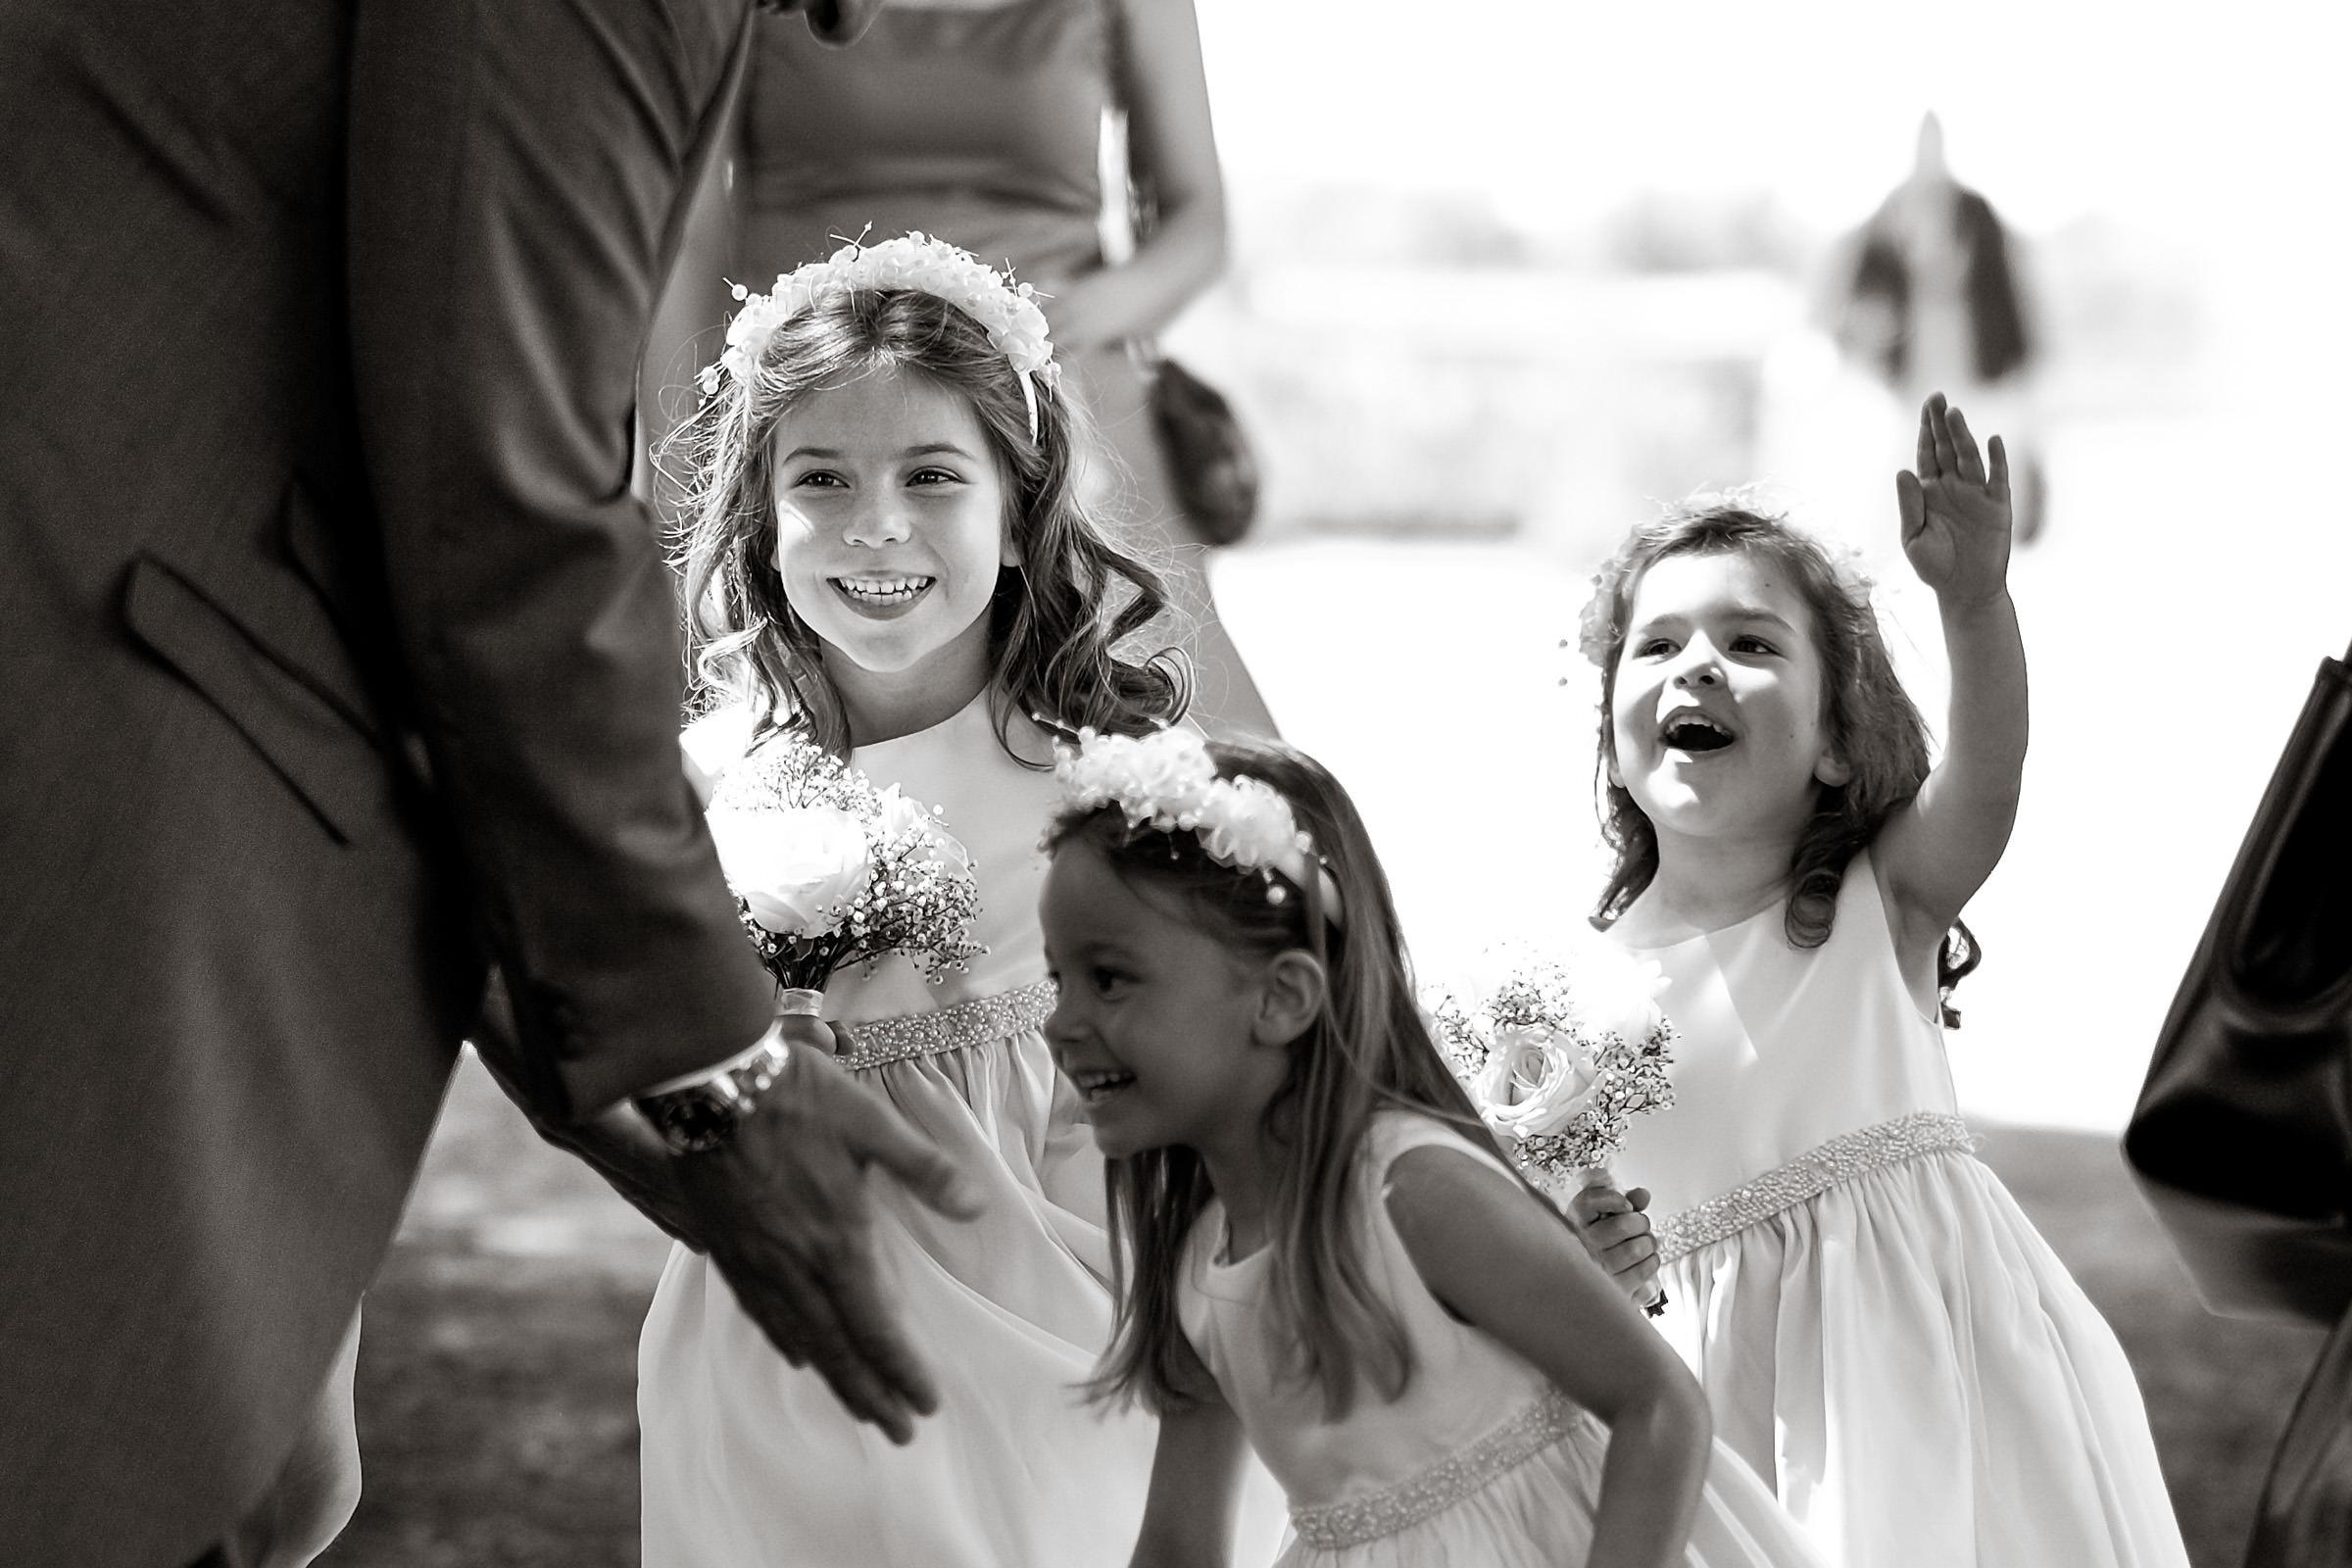 Wedding at Clandon Park in Guildford 004.jpg